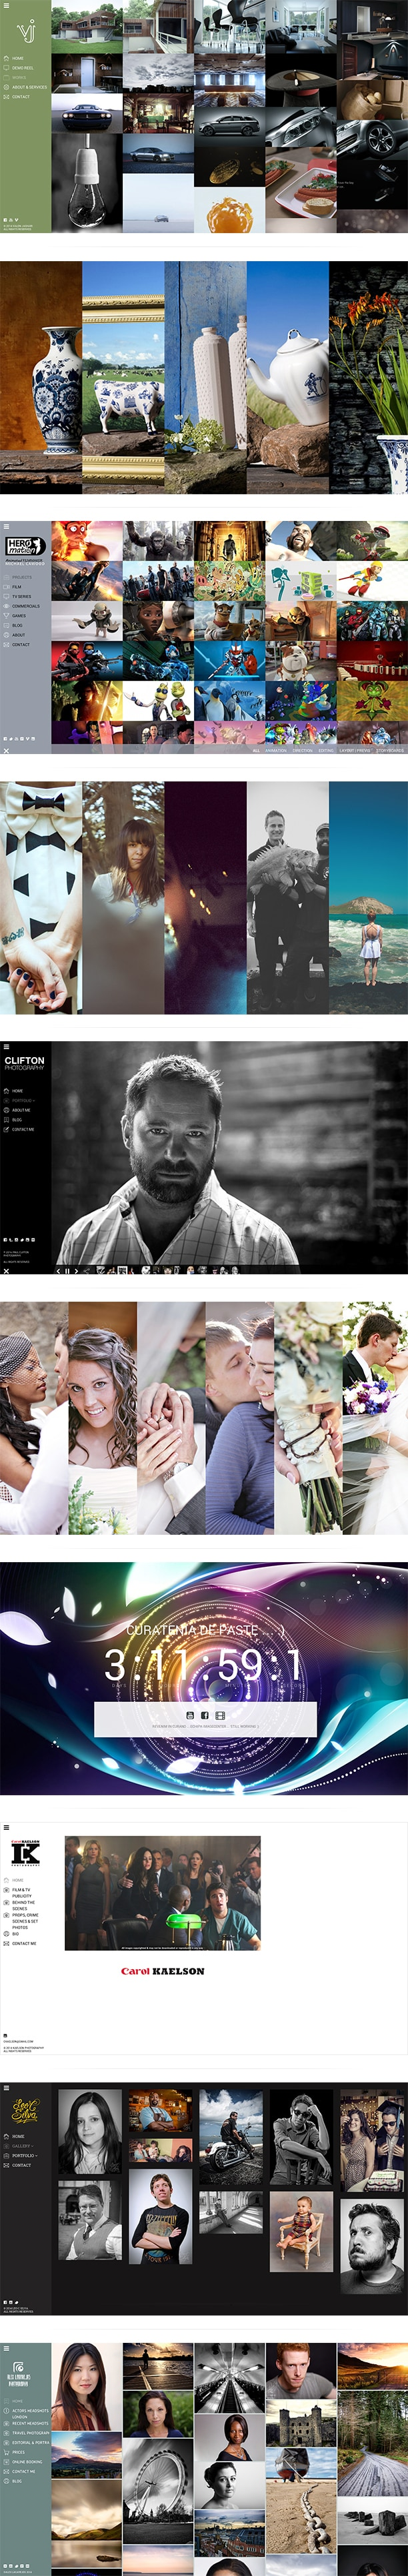 1627489578 794 1 - eClipse - Photography Portfolio